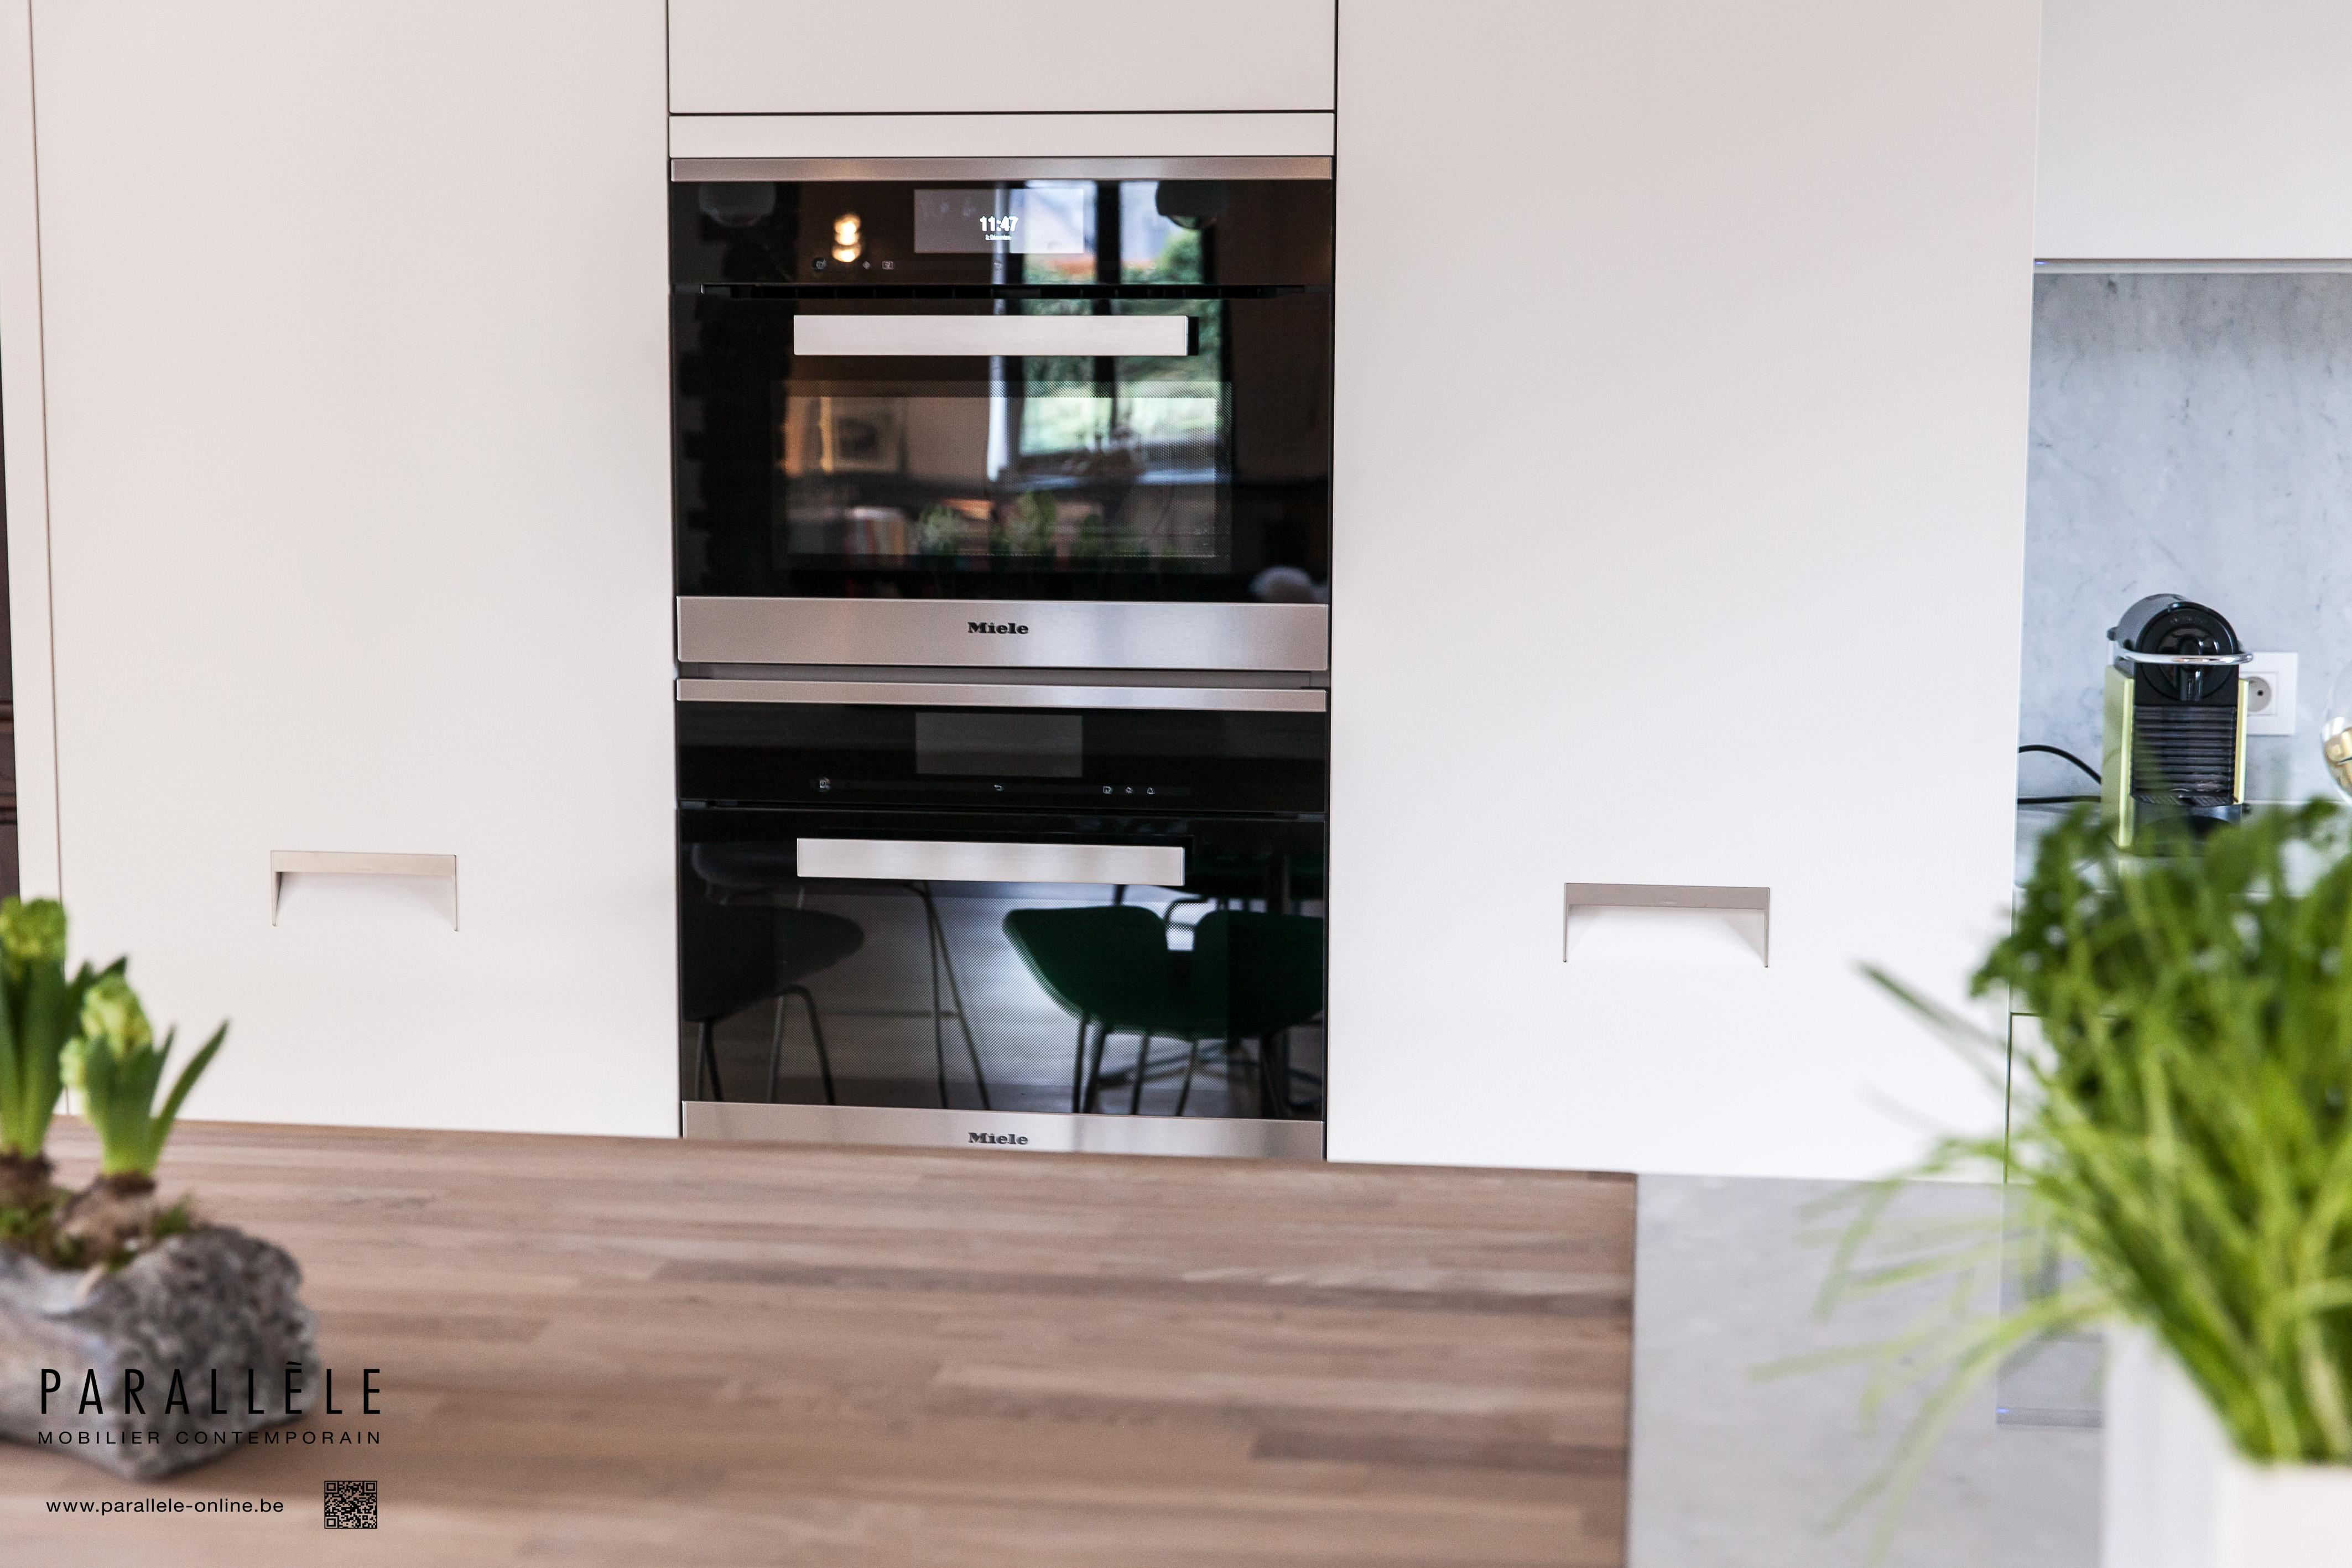 modele cuisine parallele modele de cuisine avec ilot les